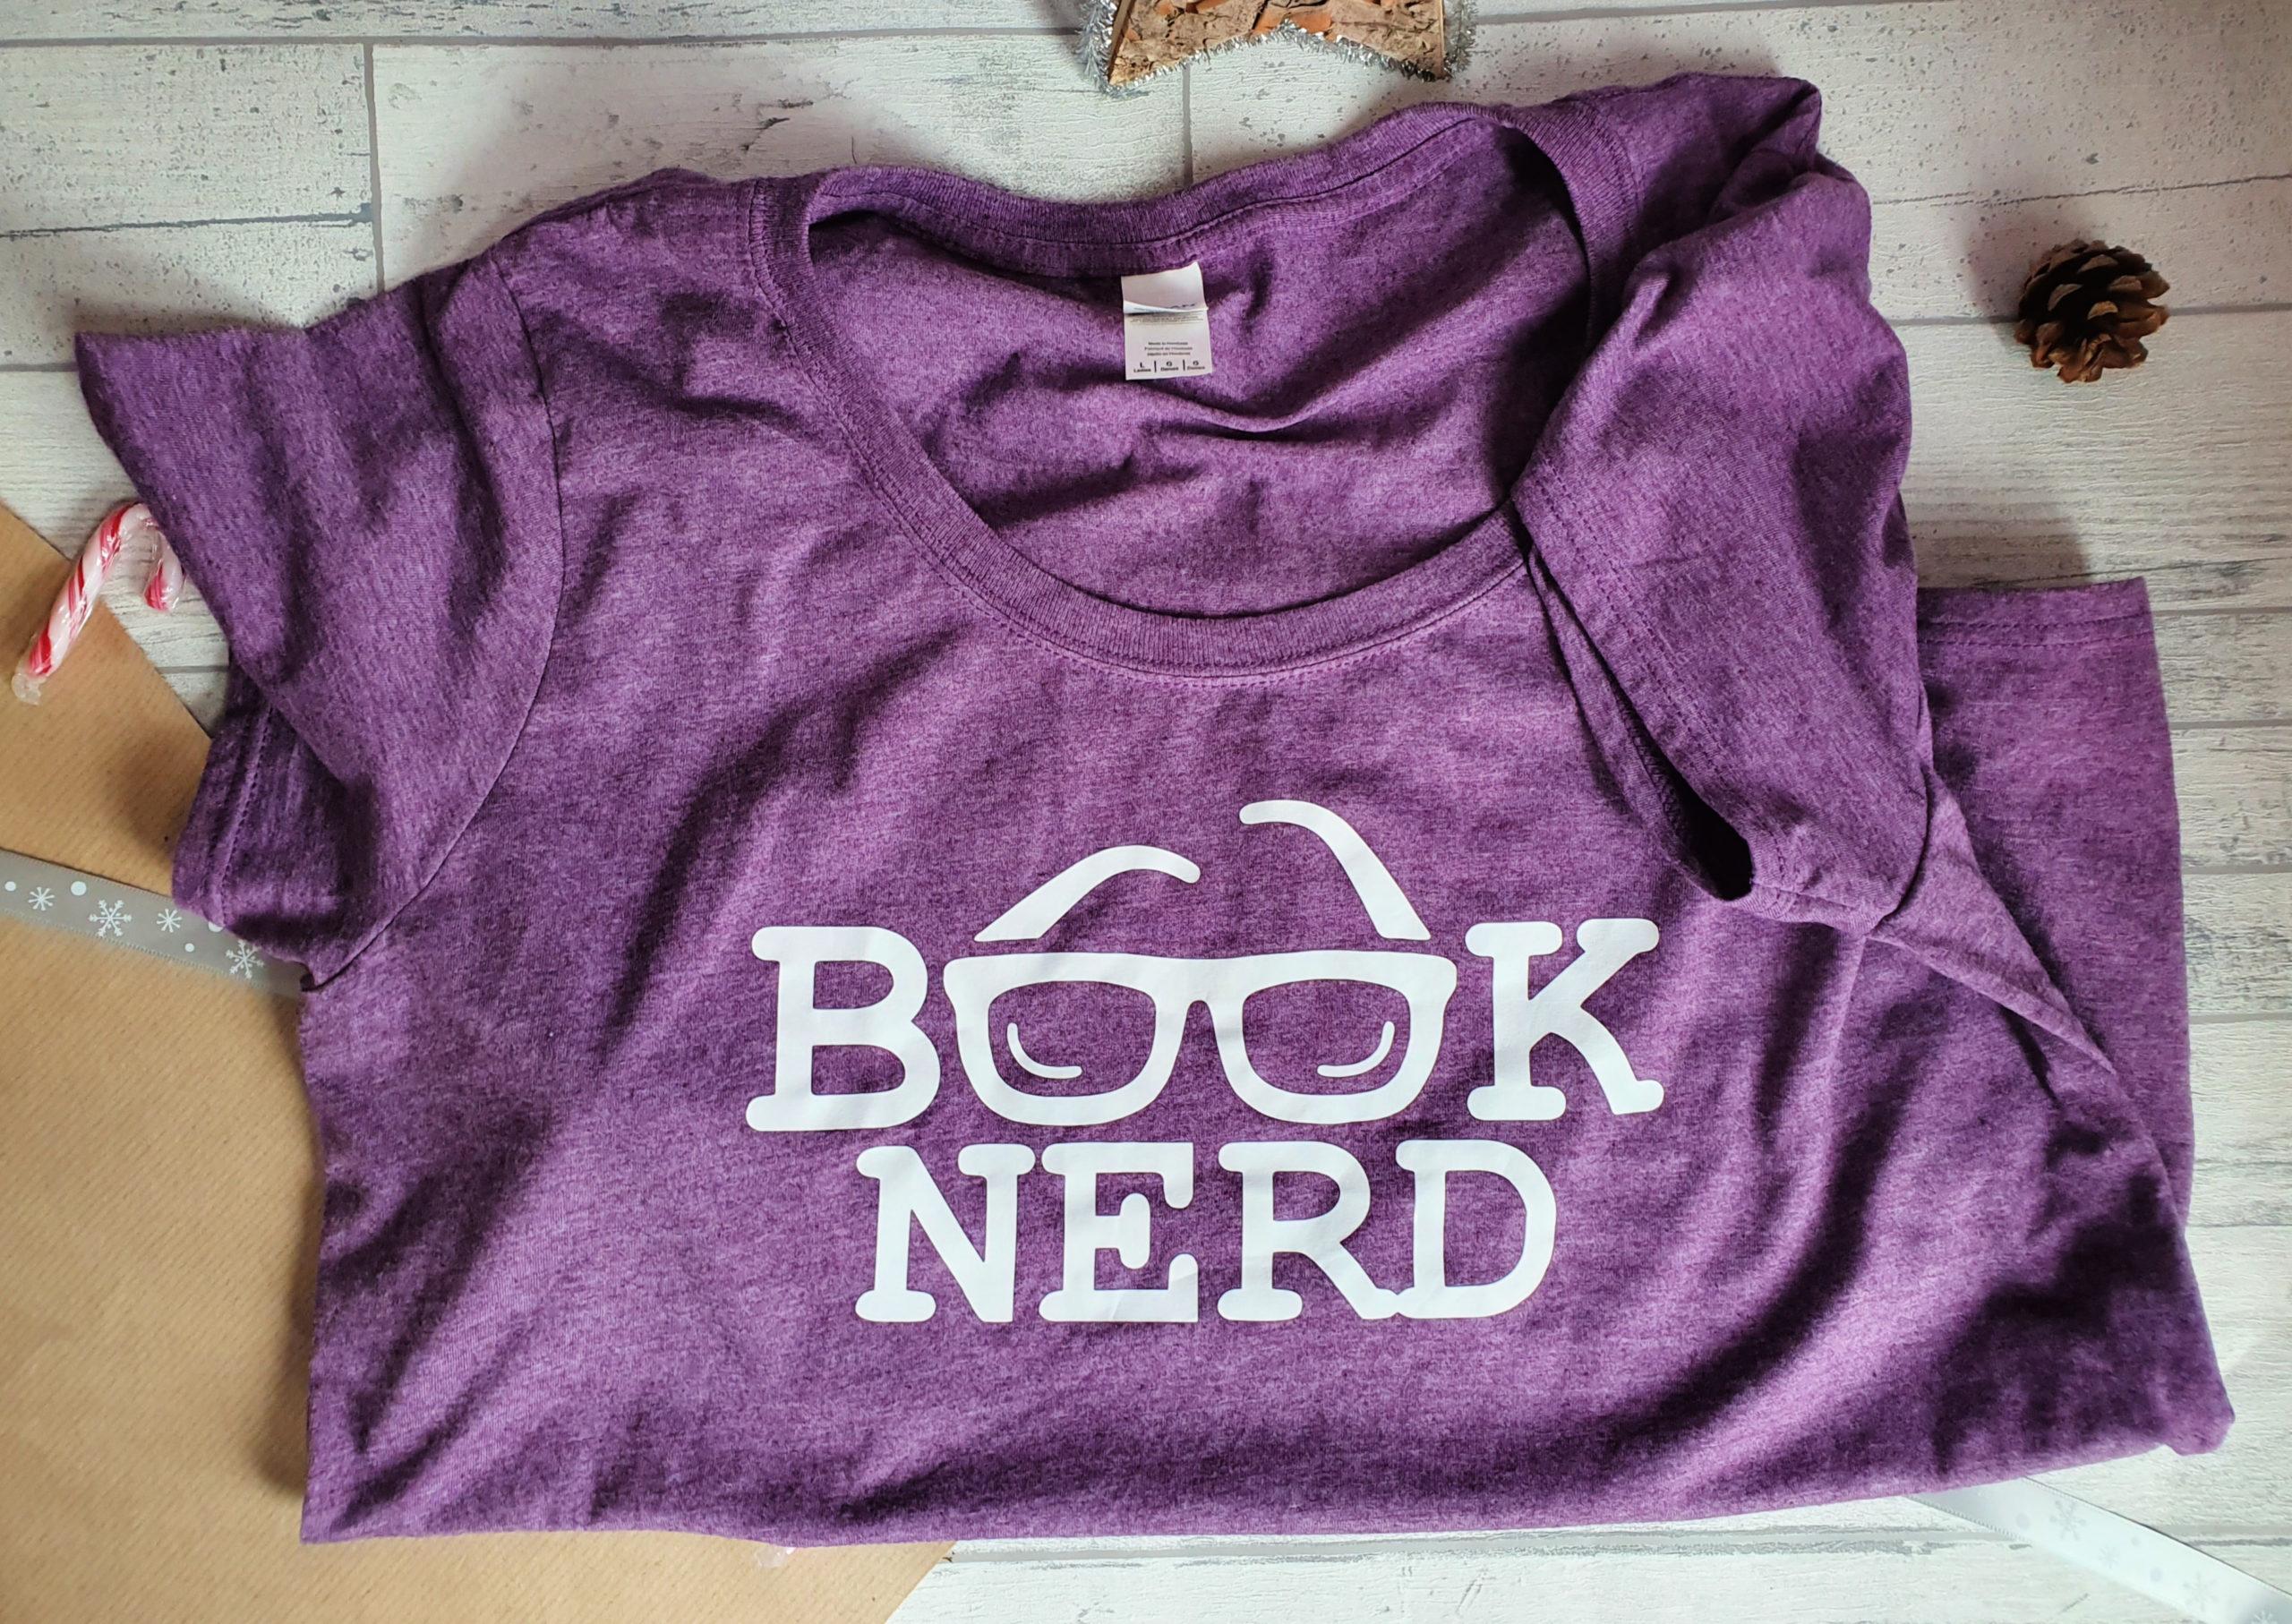 Book nerd tshirt